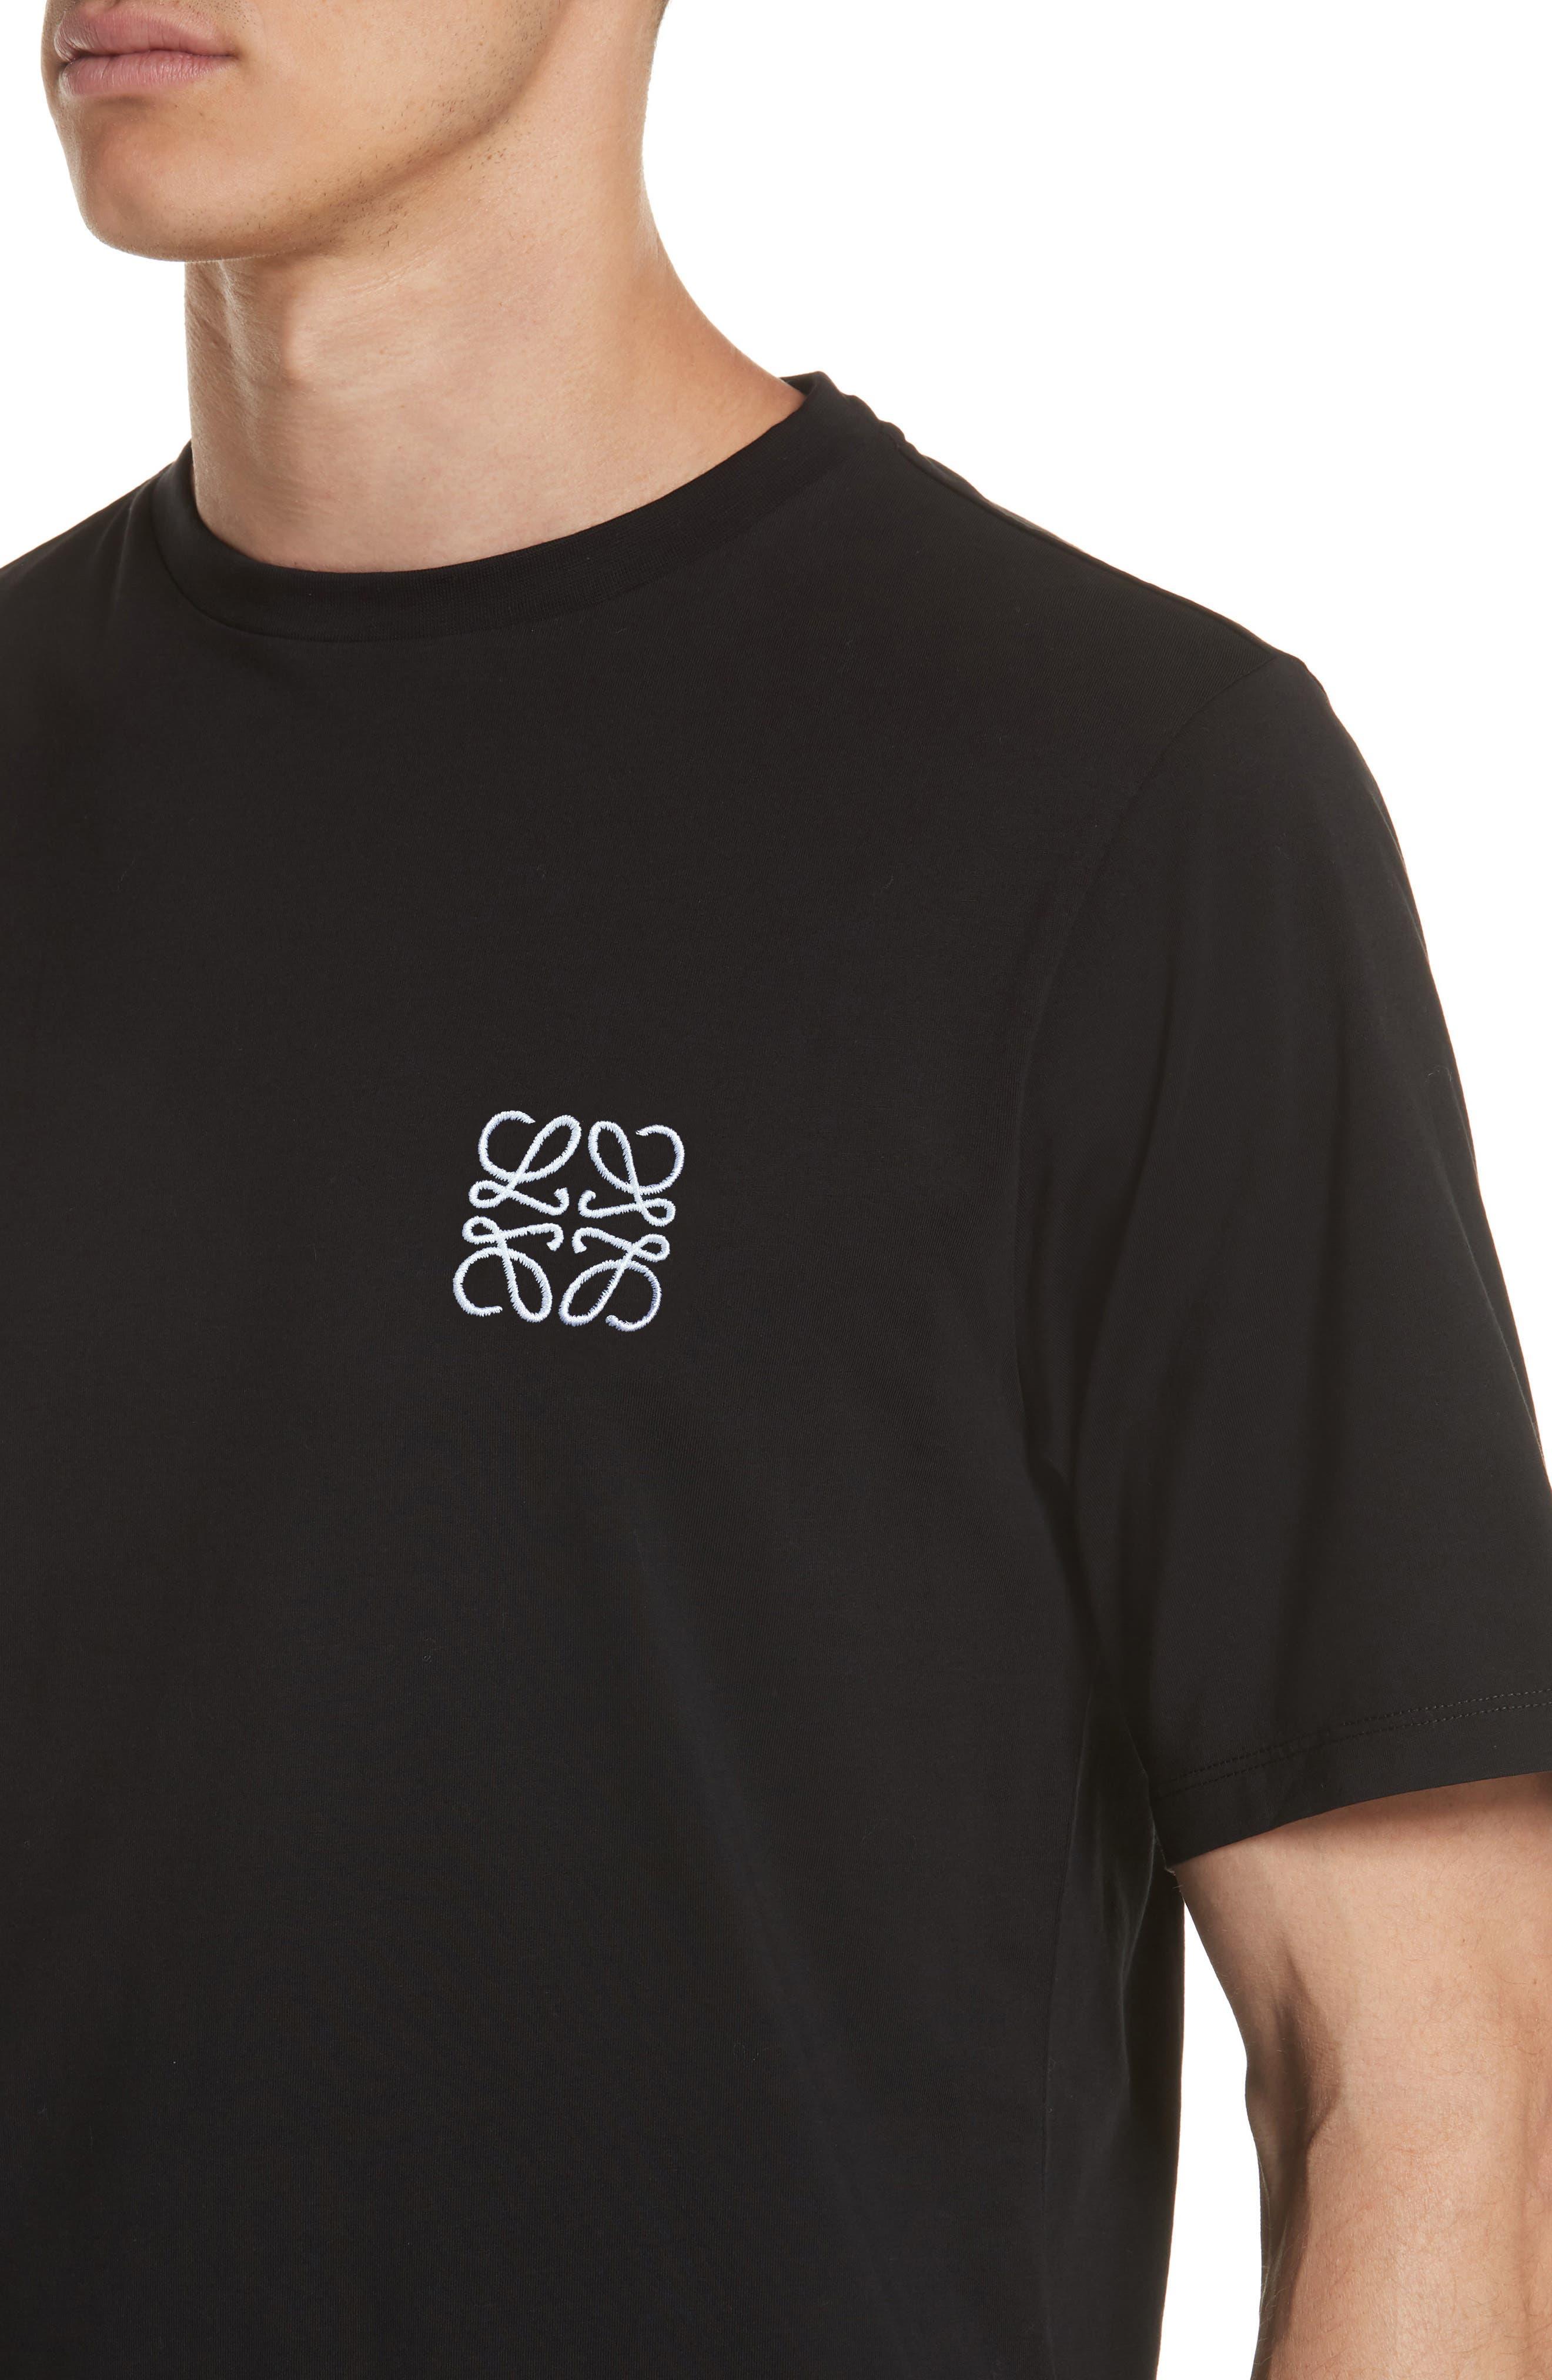 LOEWE, Anagram Logo T-Shirt, Alternate thumbnail 4, color, BLACK